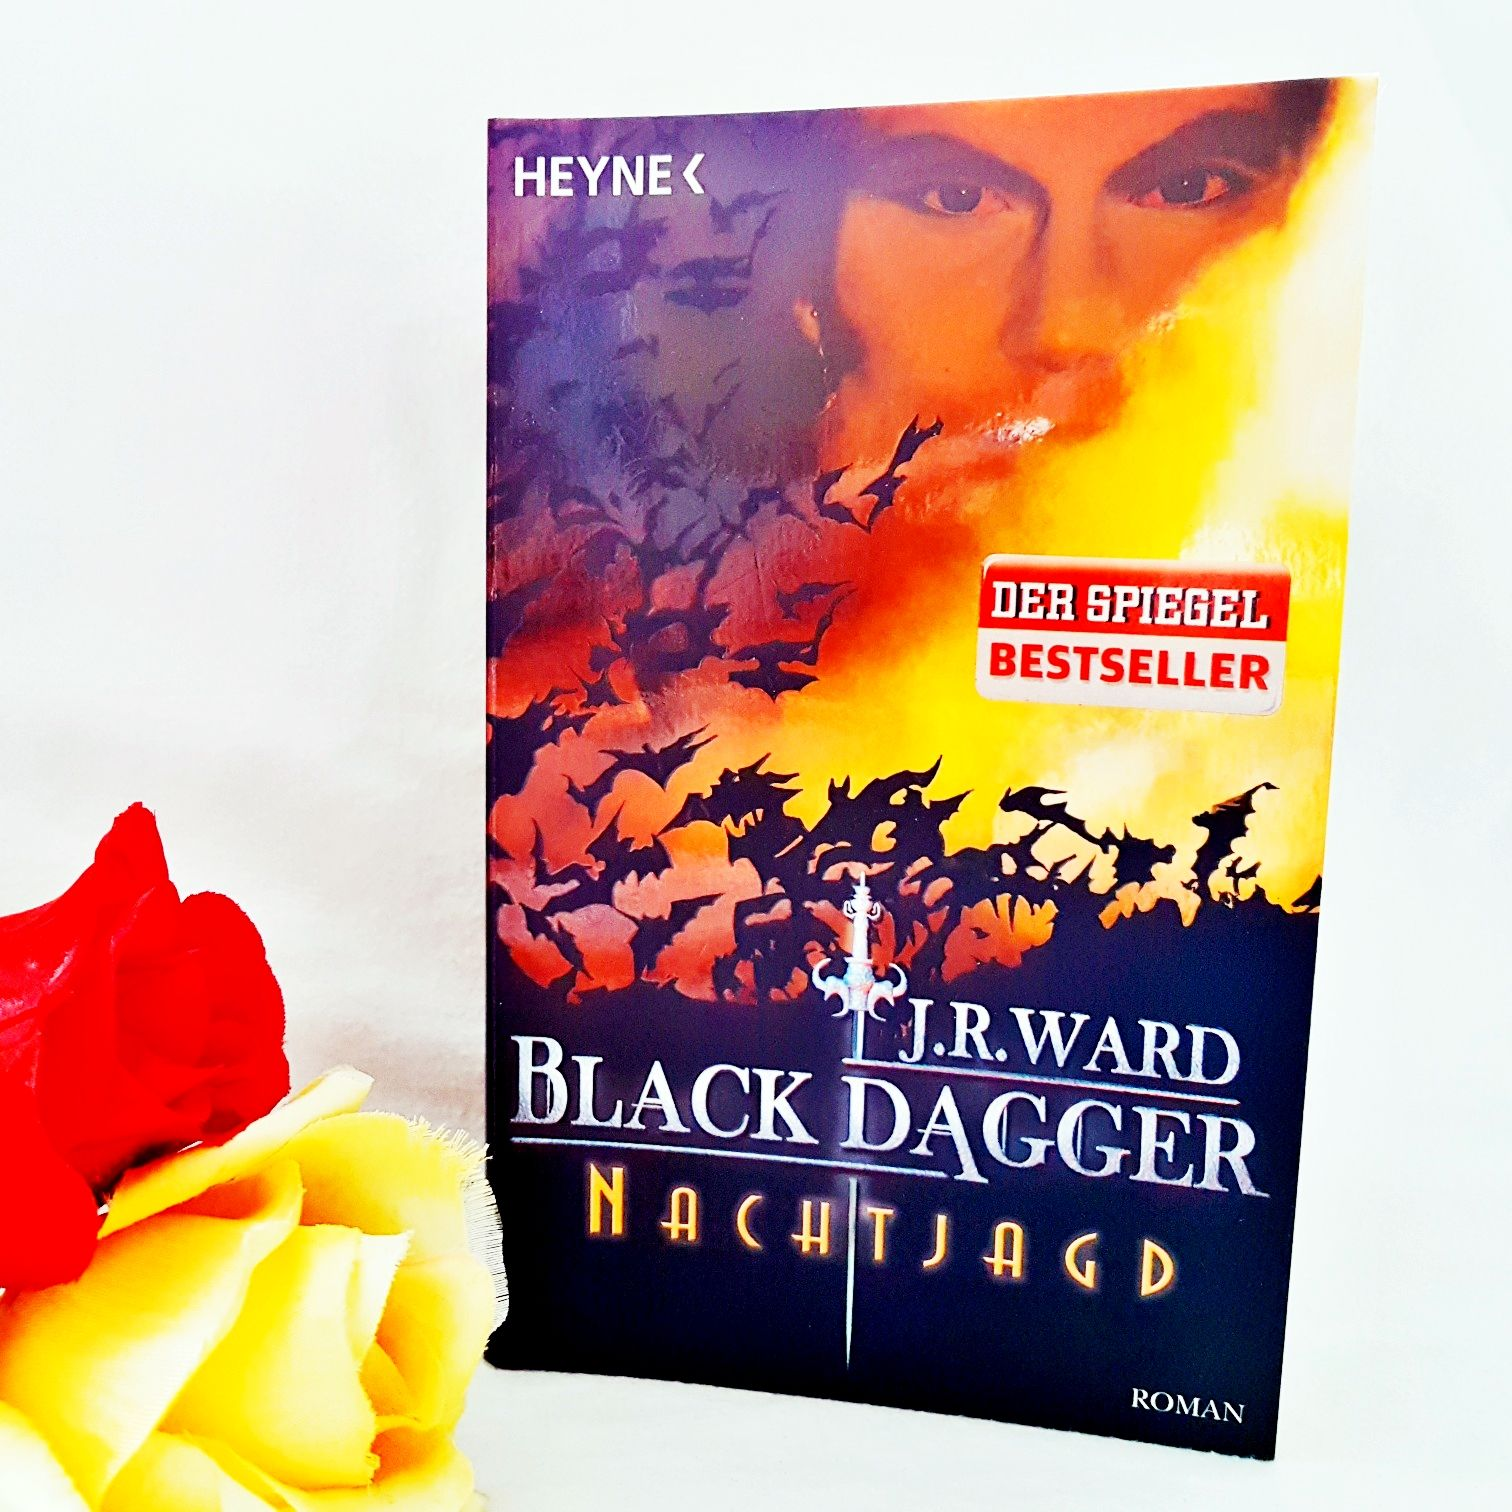 Black Dagger Nachtjagd von J.R.Ward